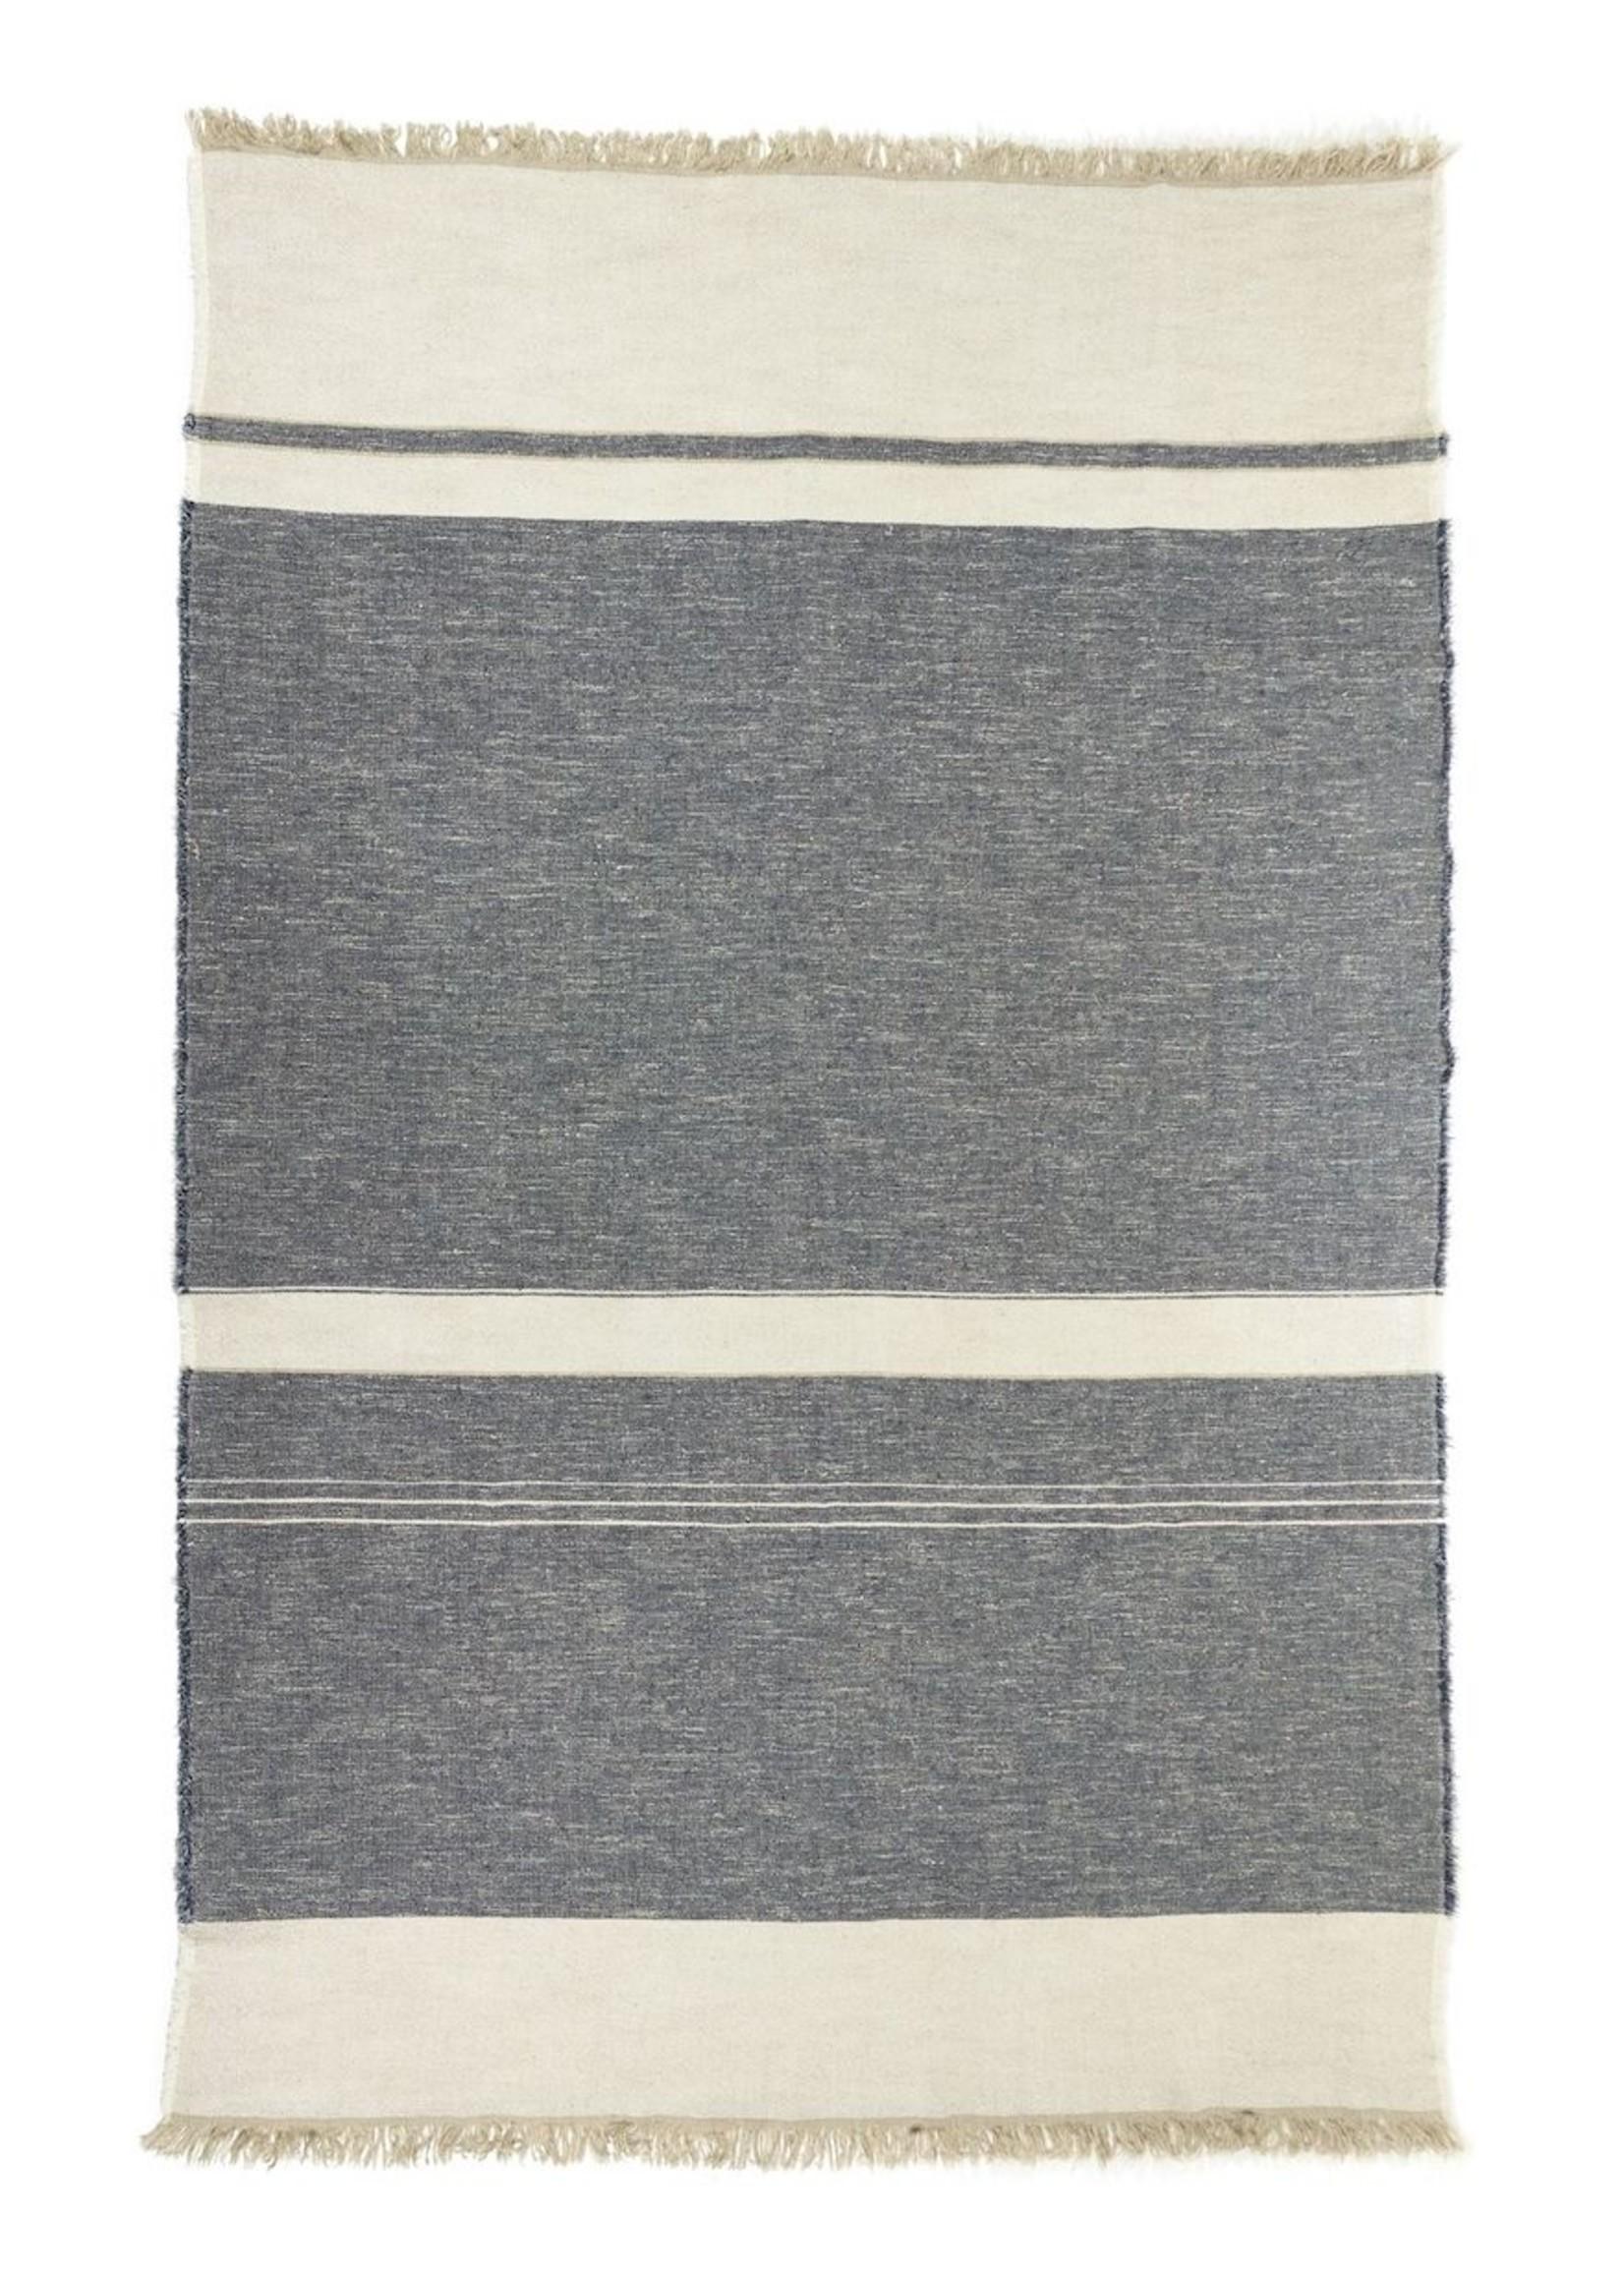 Libeco Libeco North Sea Stripe Linen Throw